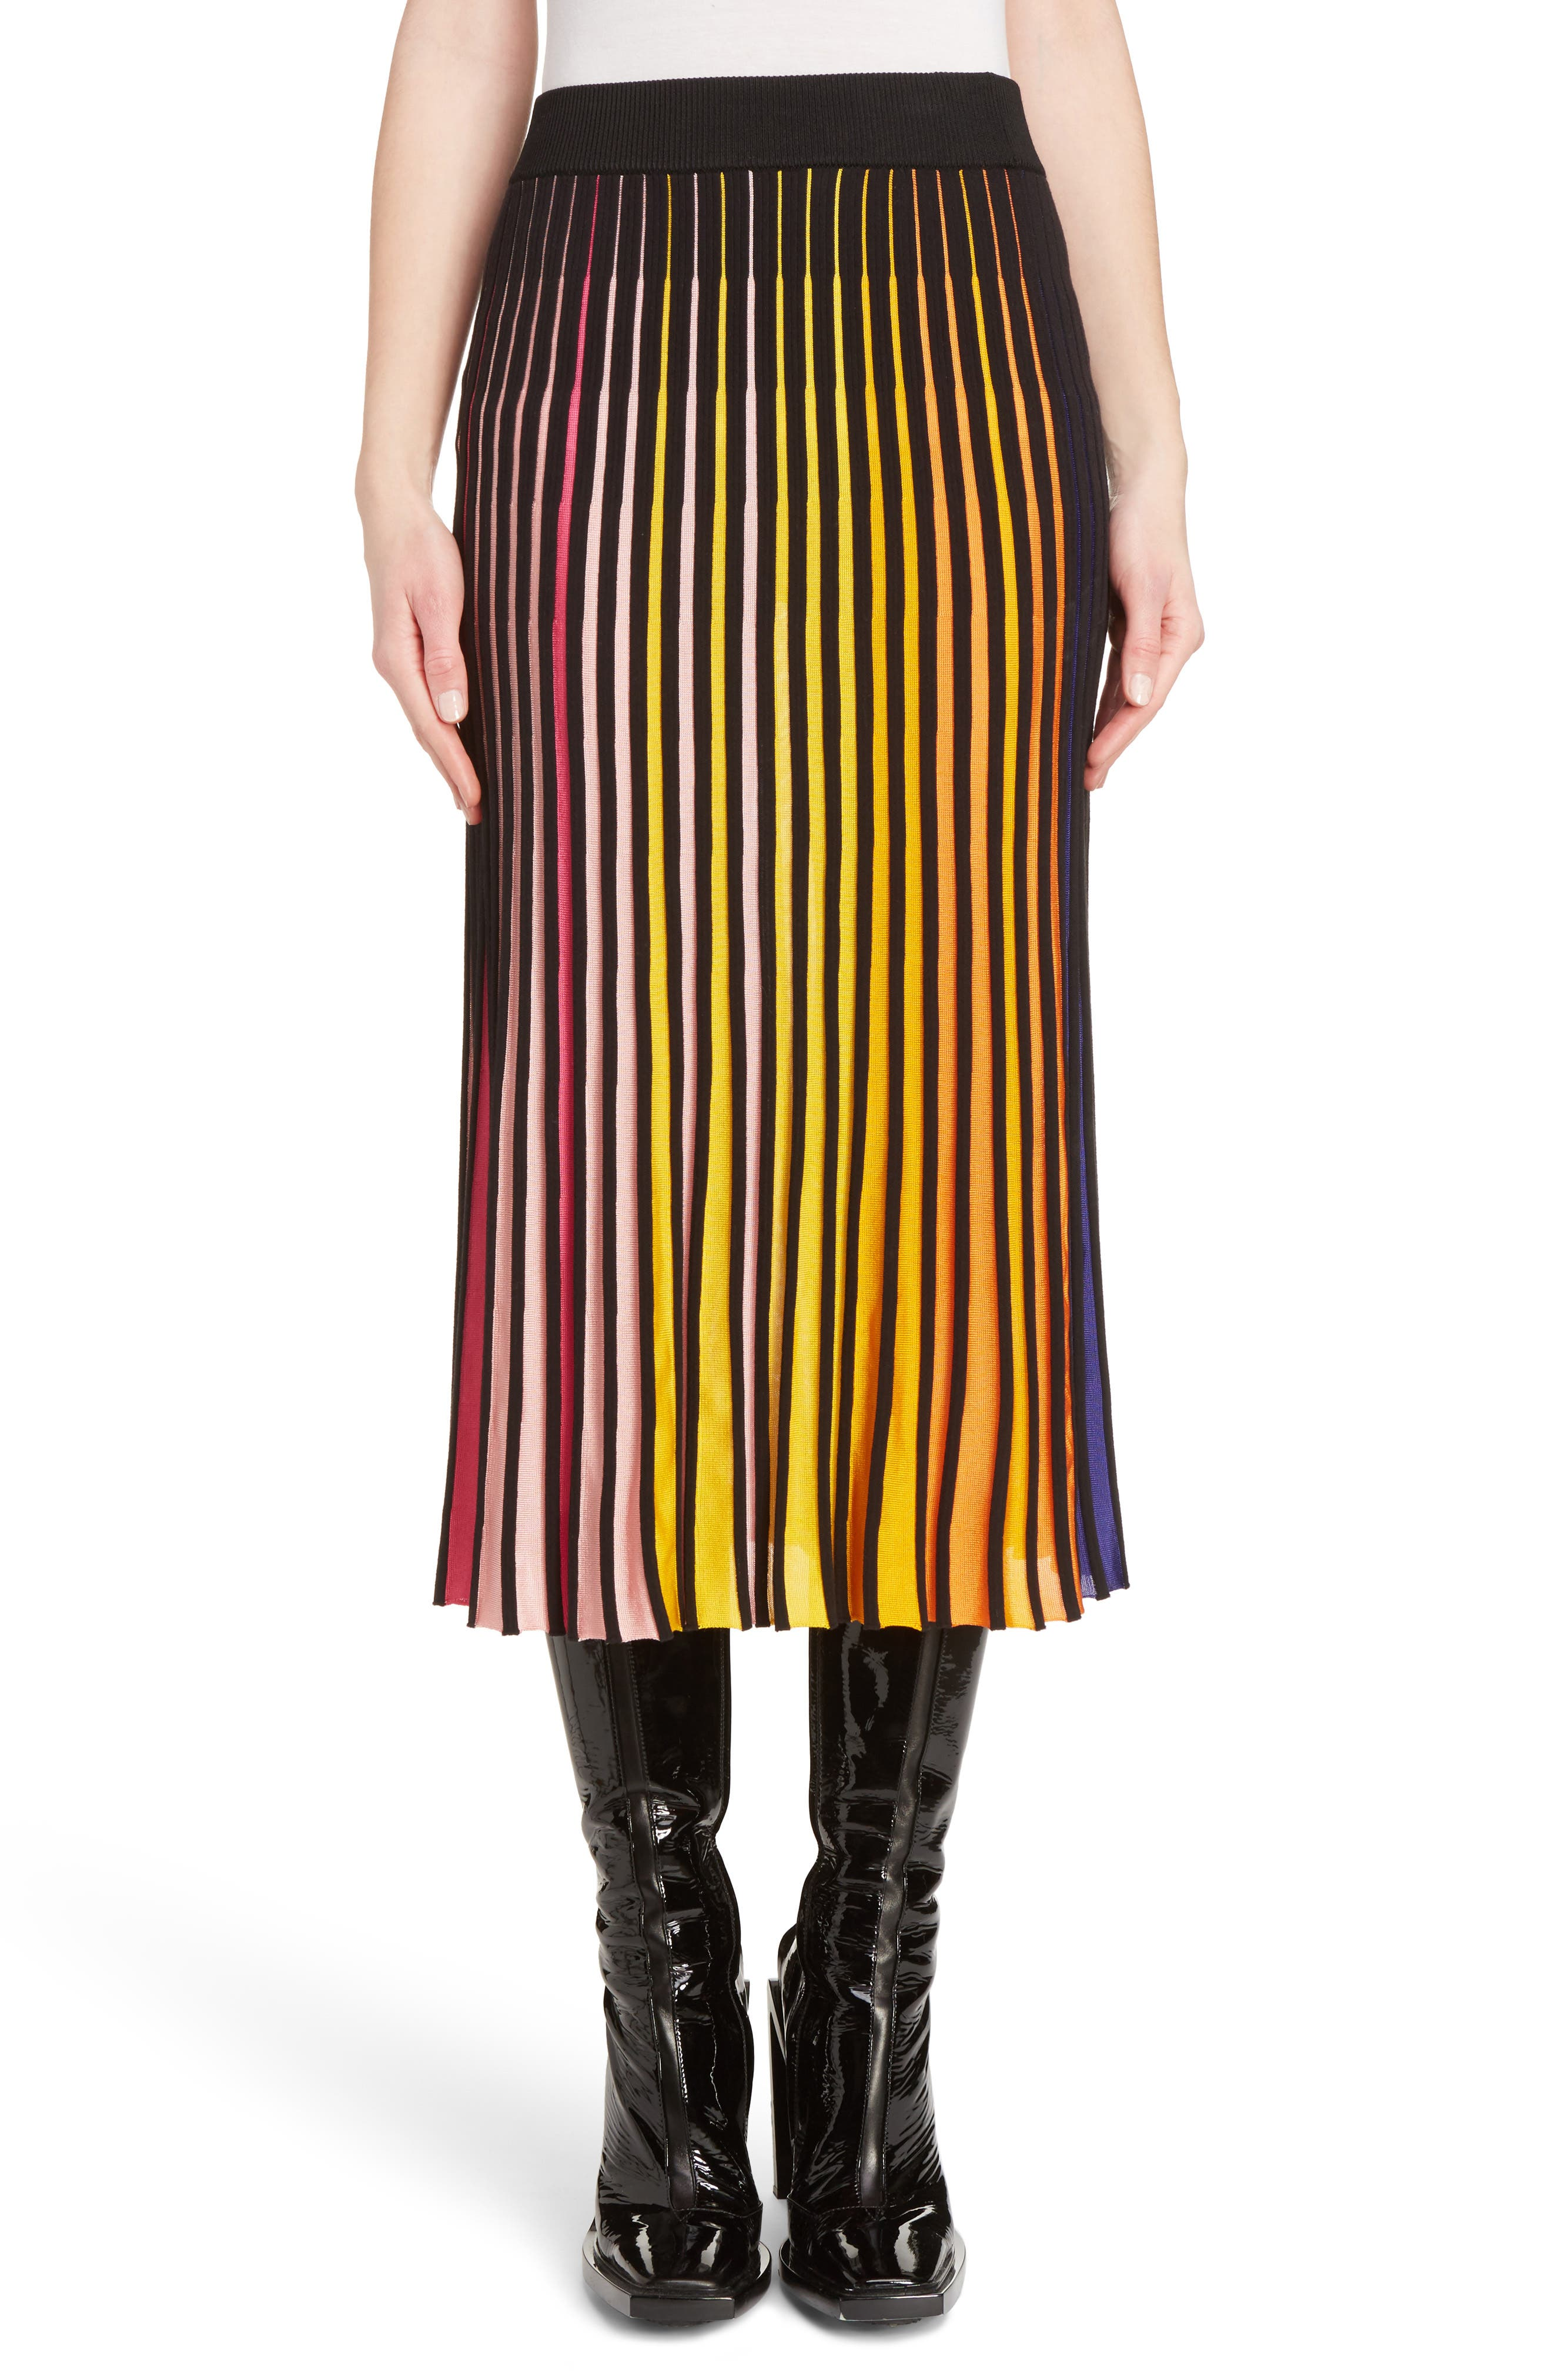 KENZO Rib Knit Flare Skirt